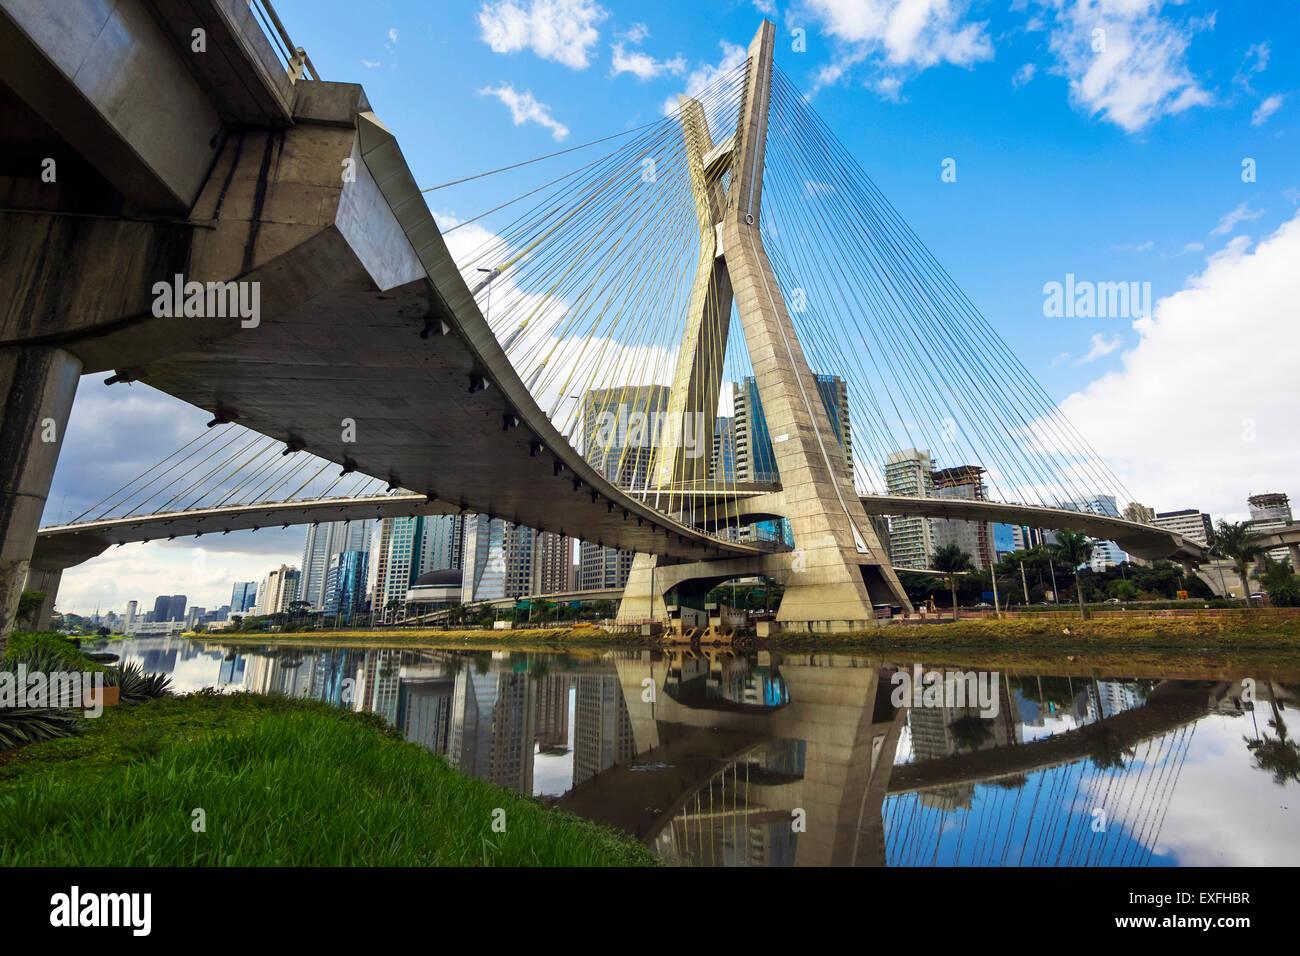 Il Octavio Frias de Oliveira ponte o Ponte Estaiada, in Sao Paulo, Brasile. Immagini Stock